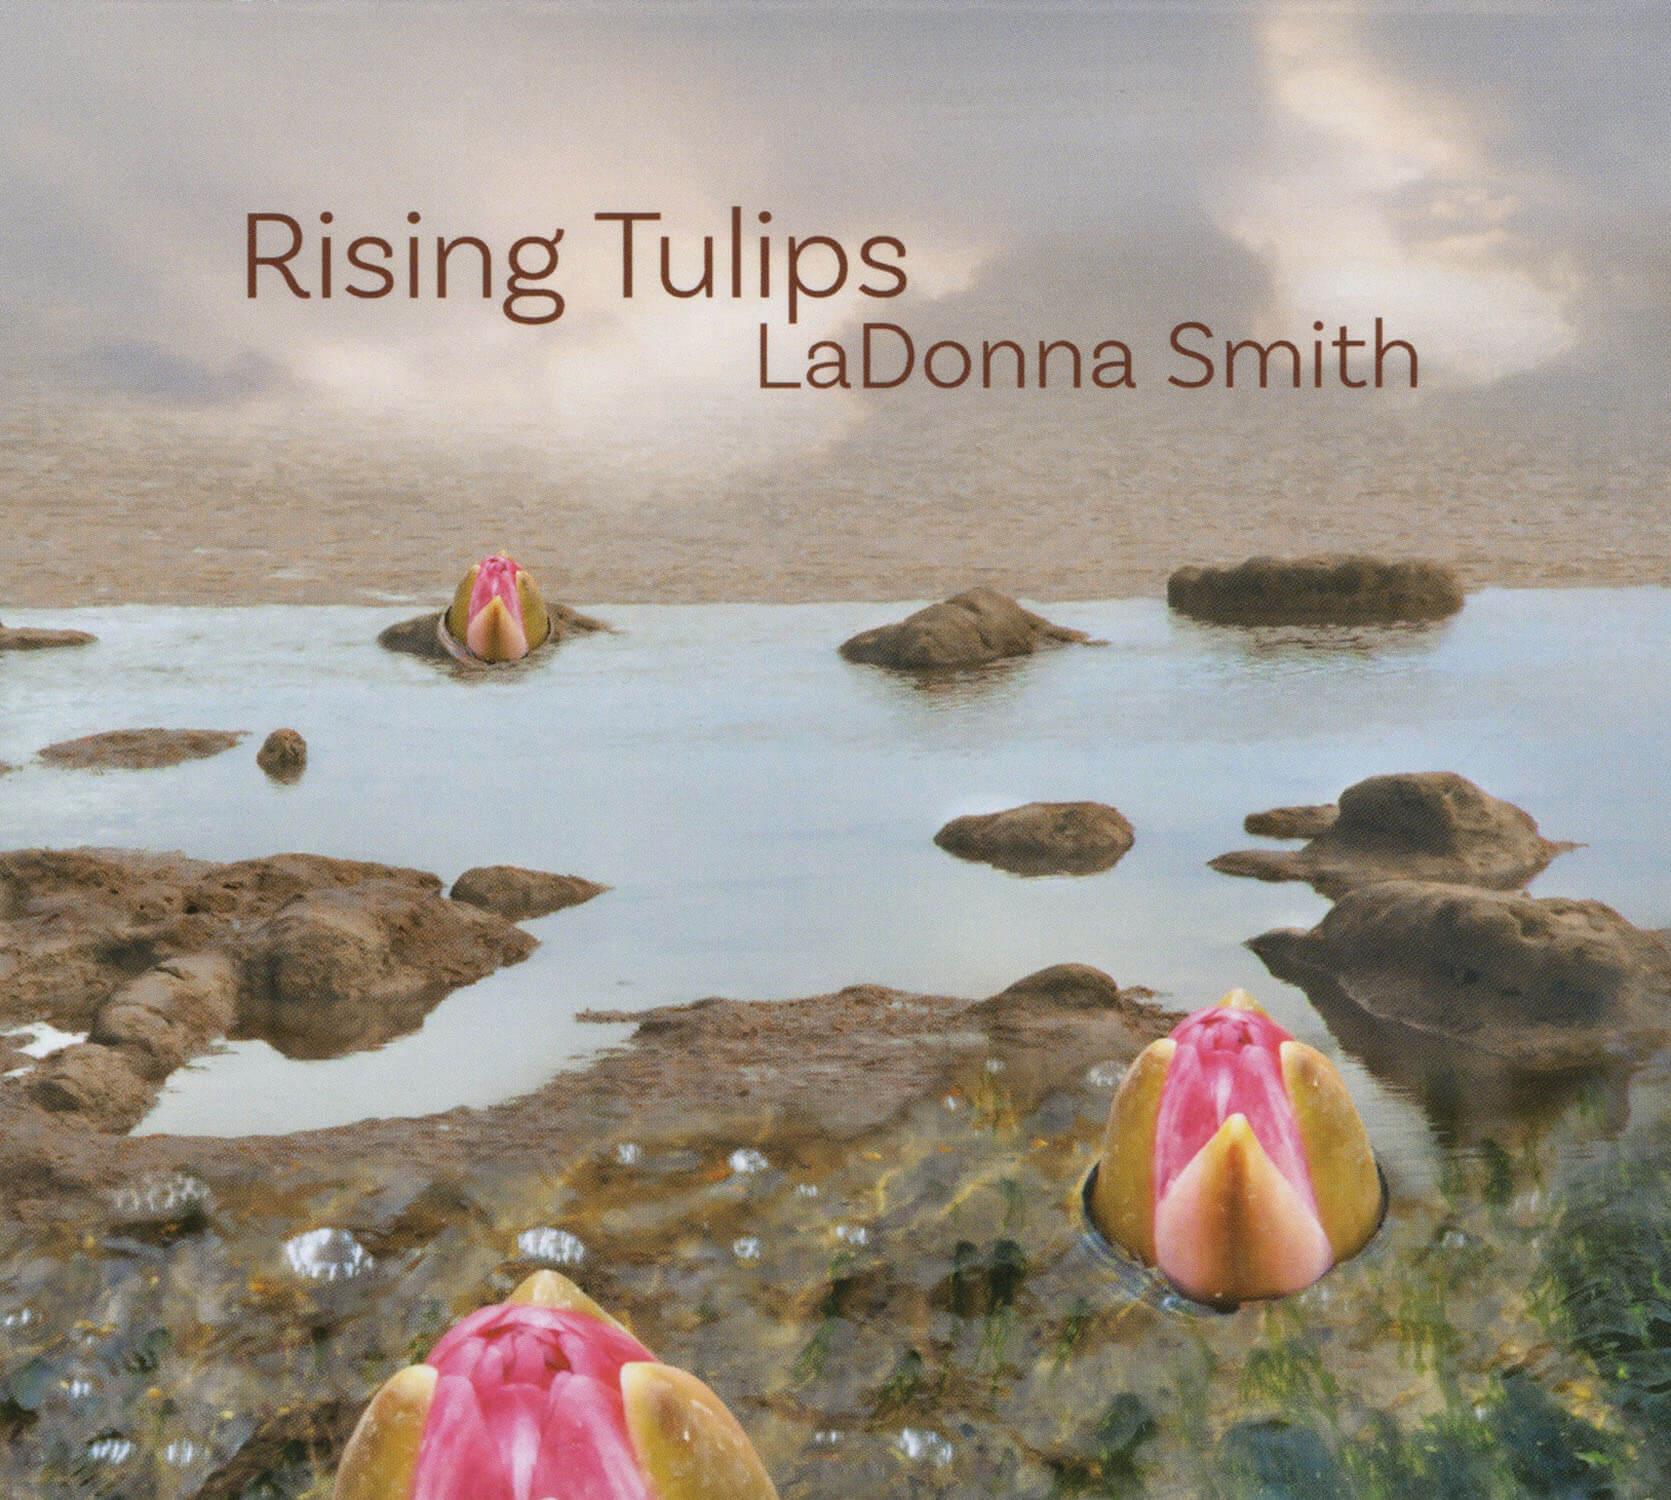 Rising Tulips